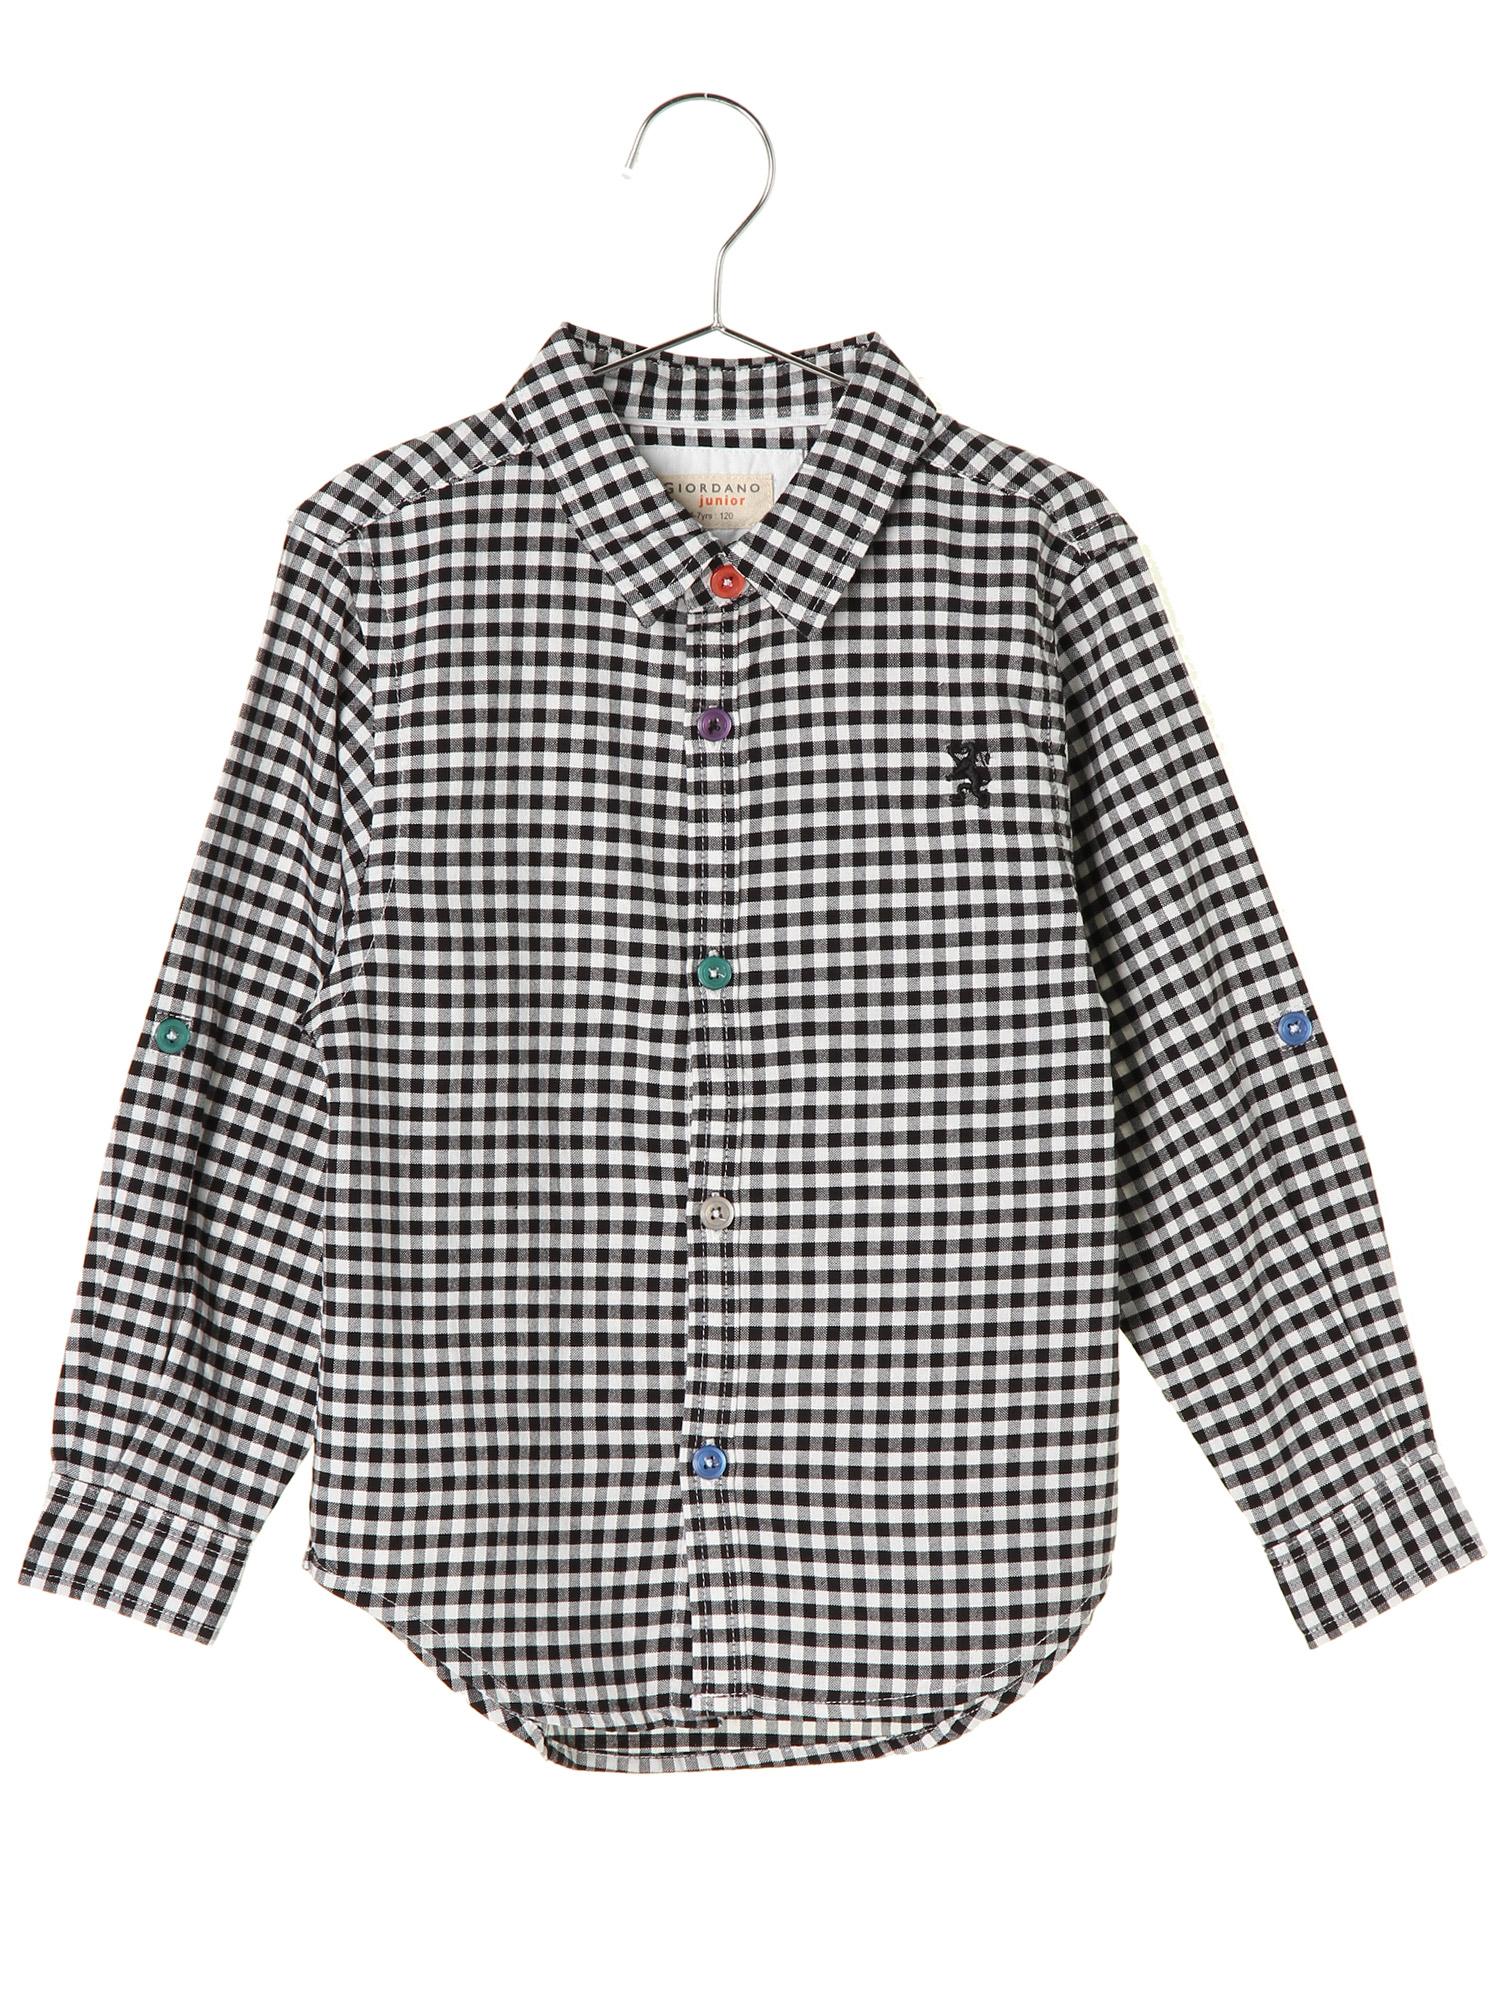 [GIORDANO]ライオン刺繍オックスフォードギンガムチェックシャツ